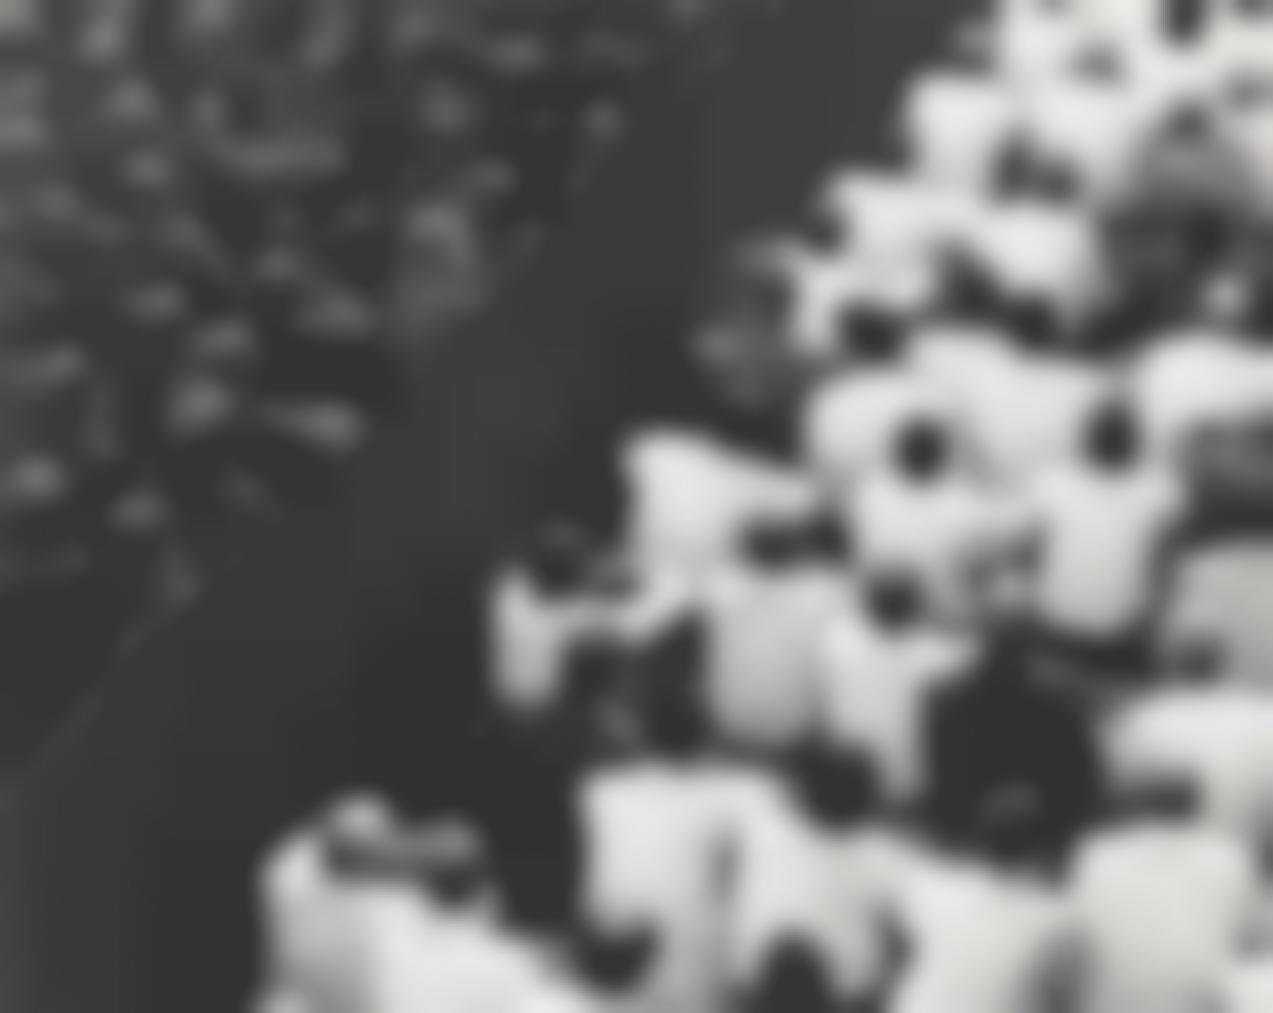 Shirin Neshat-Fervor Series (Crowd From Back, Close Up)-2000